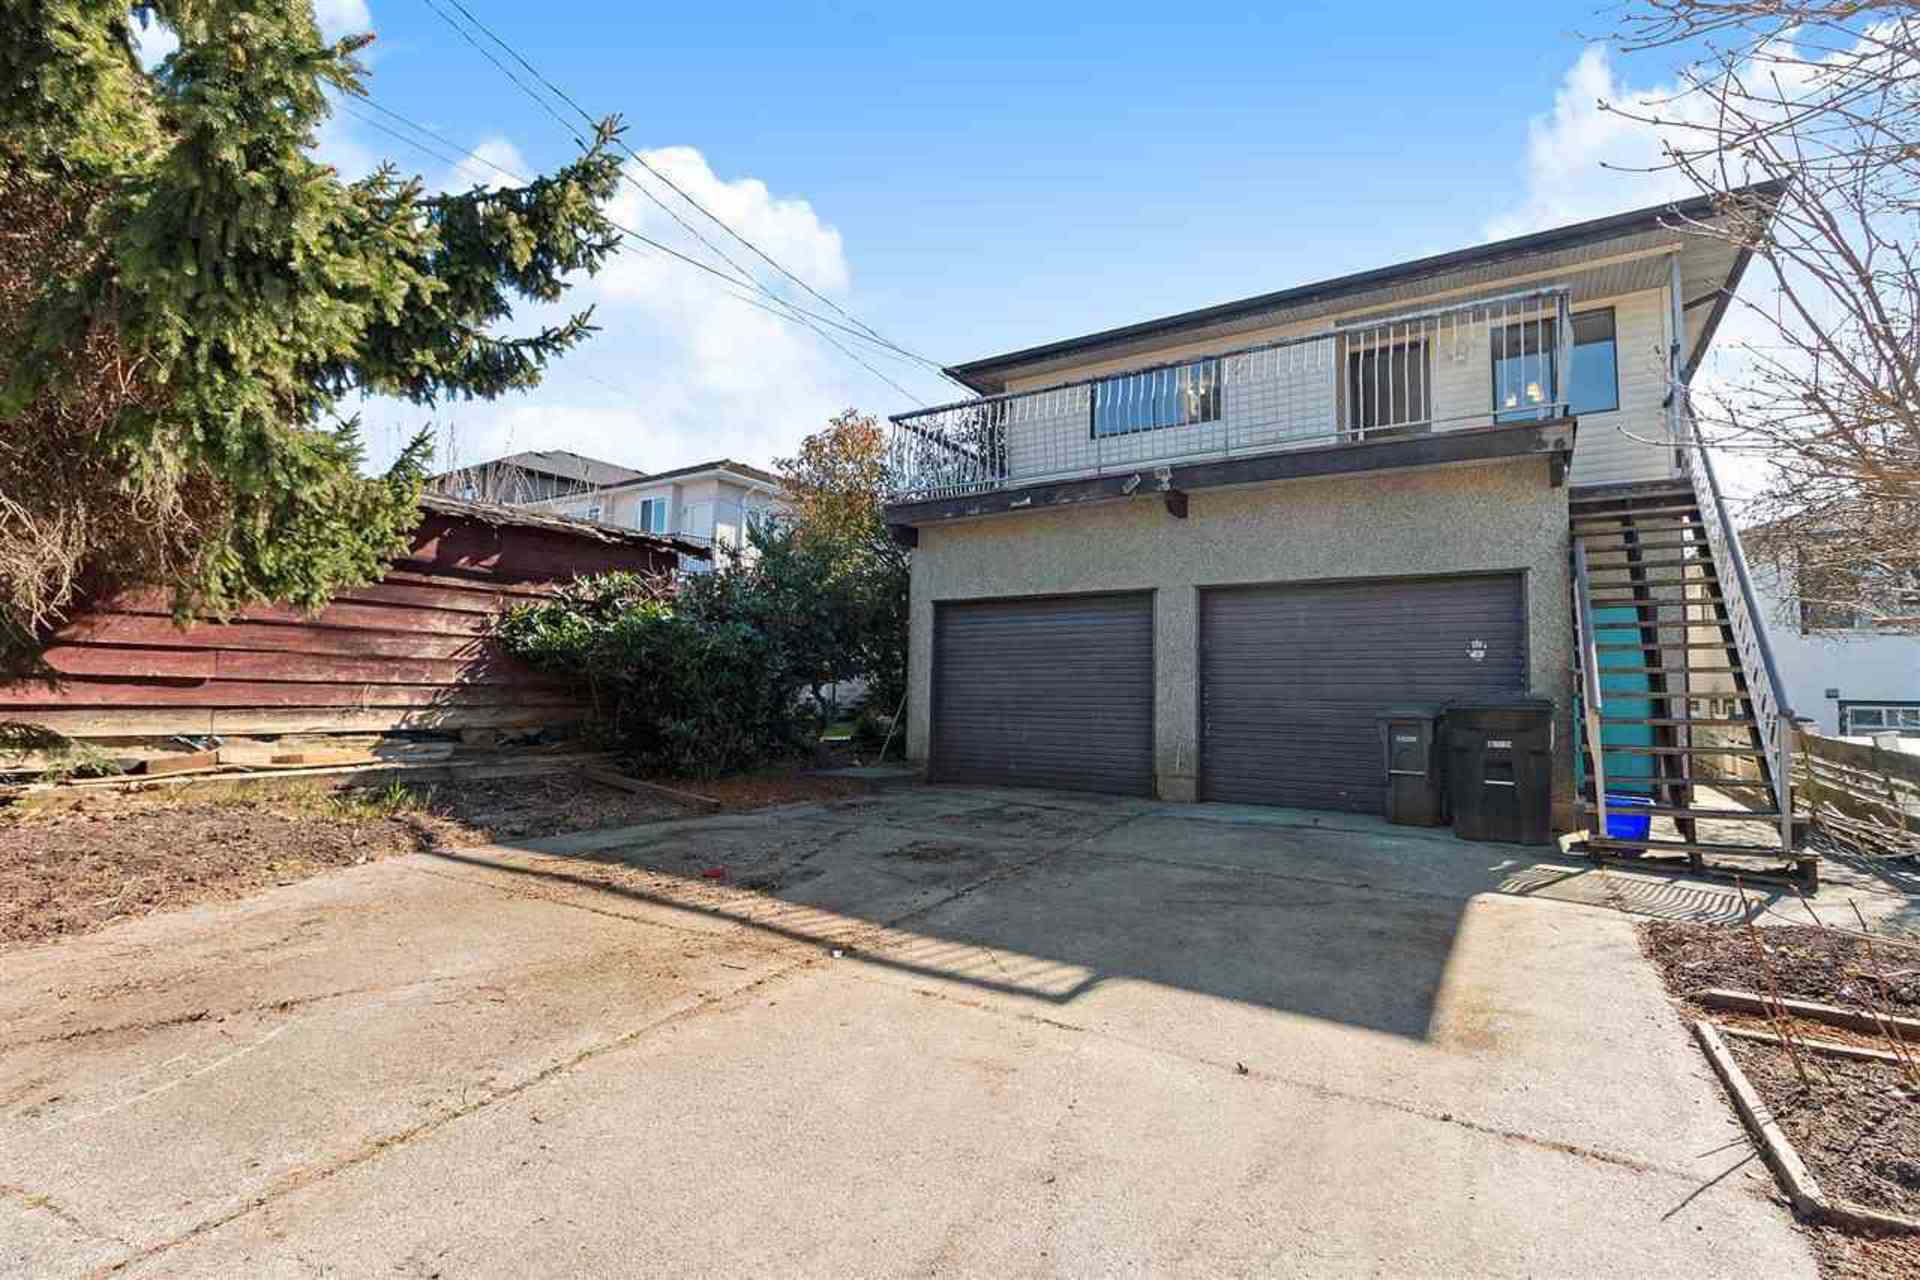 3215-grant-street-renfrew-ve-vancouver-east-19 at 3215 Grant Street, Renfrew VE, Vancouver East